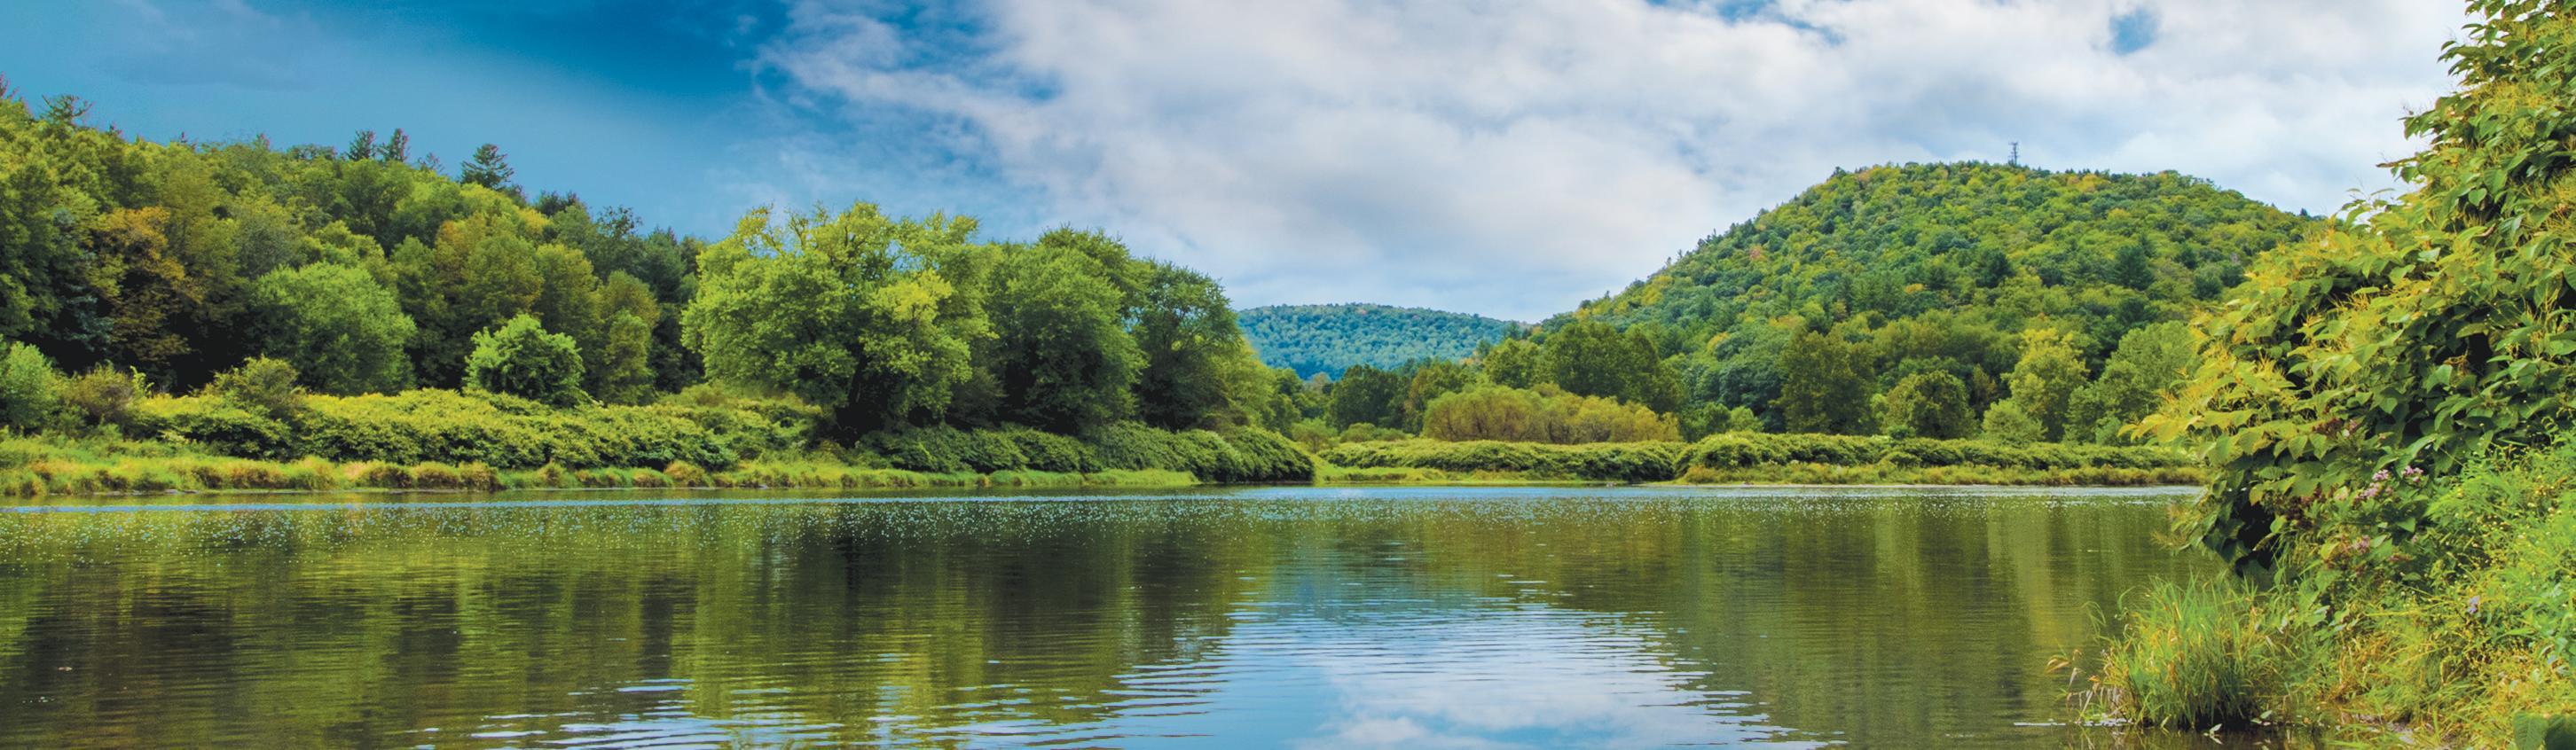 upper delaware scenic  u0026 recreational river  u s  national